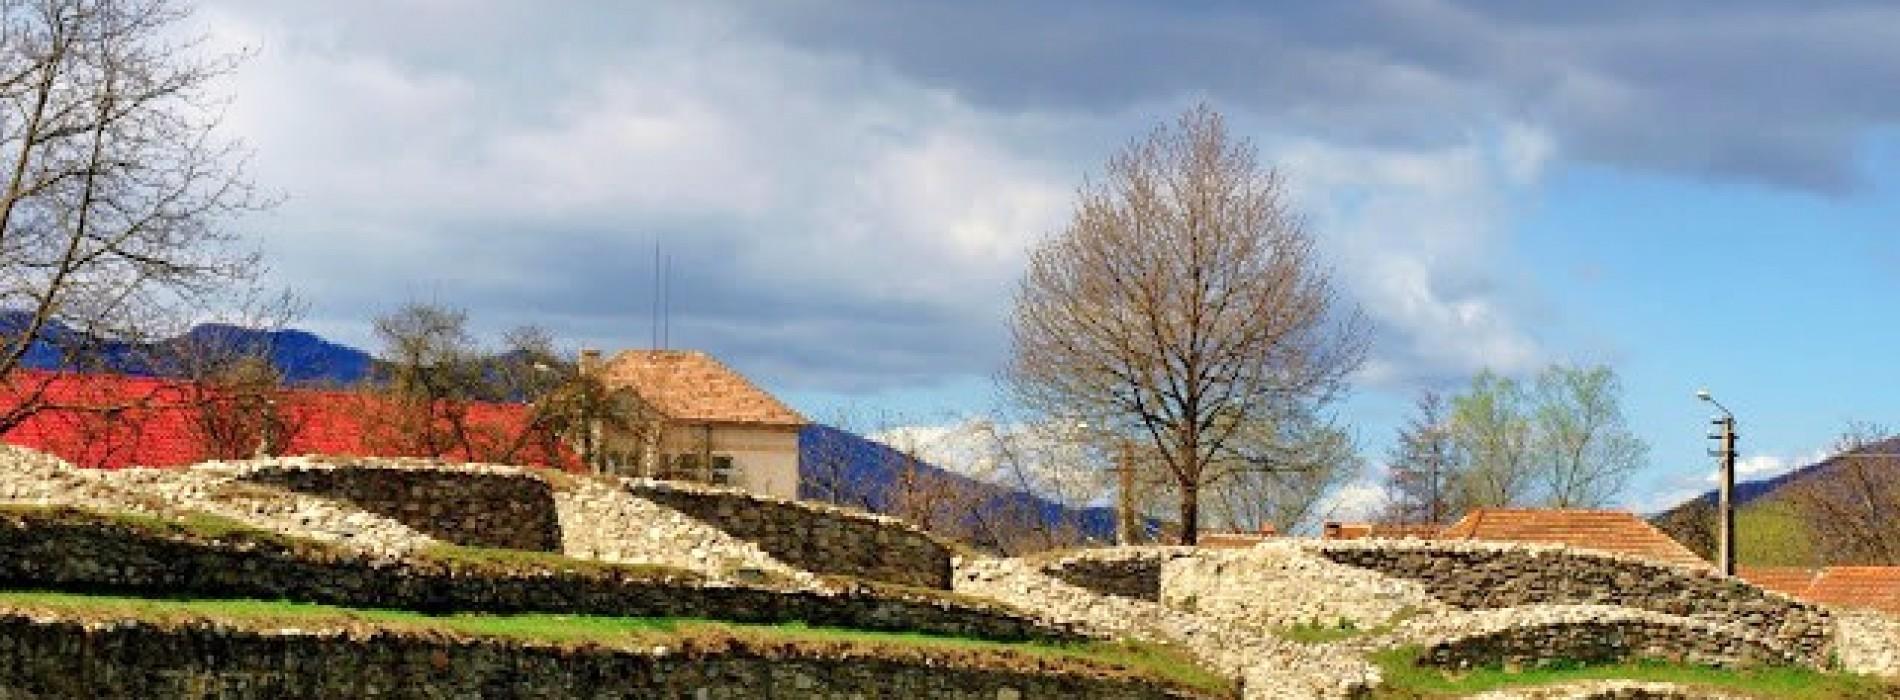 Topul The Guardian aduce in atentia lumii  complexul arheologic Ulpia Traiana Sarmizegetusa